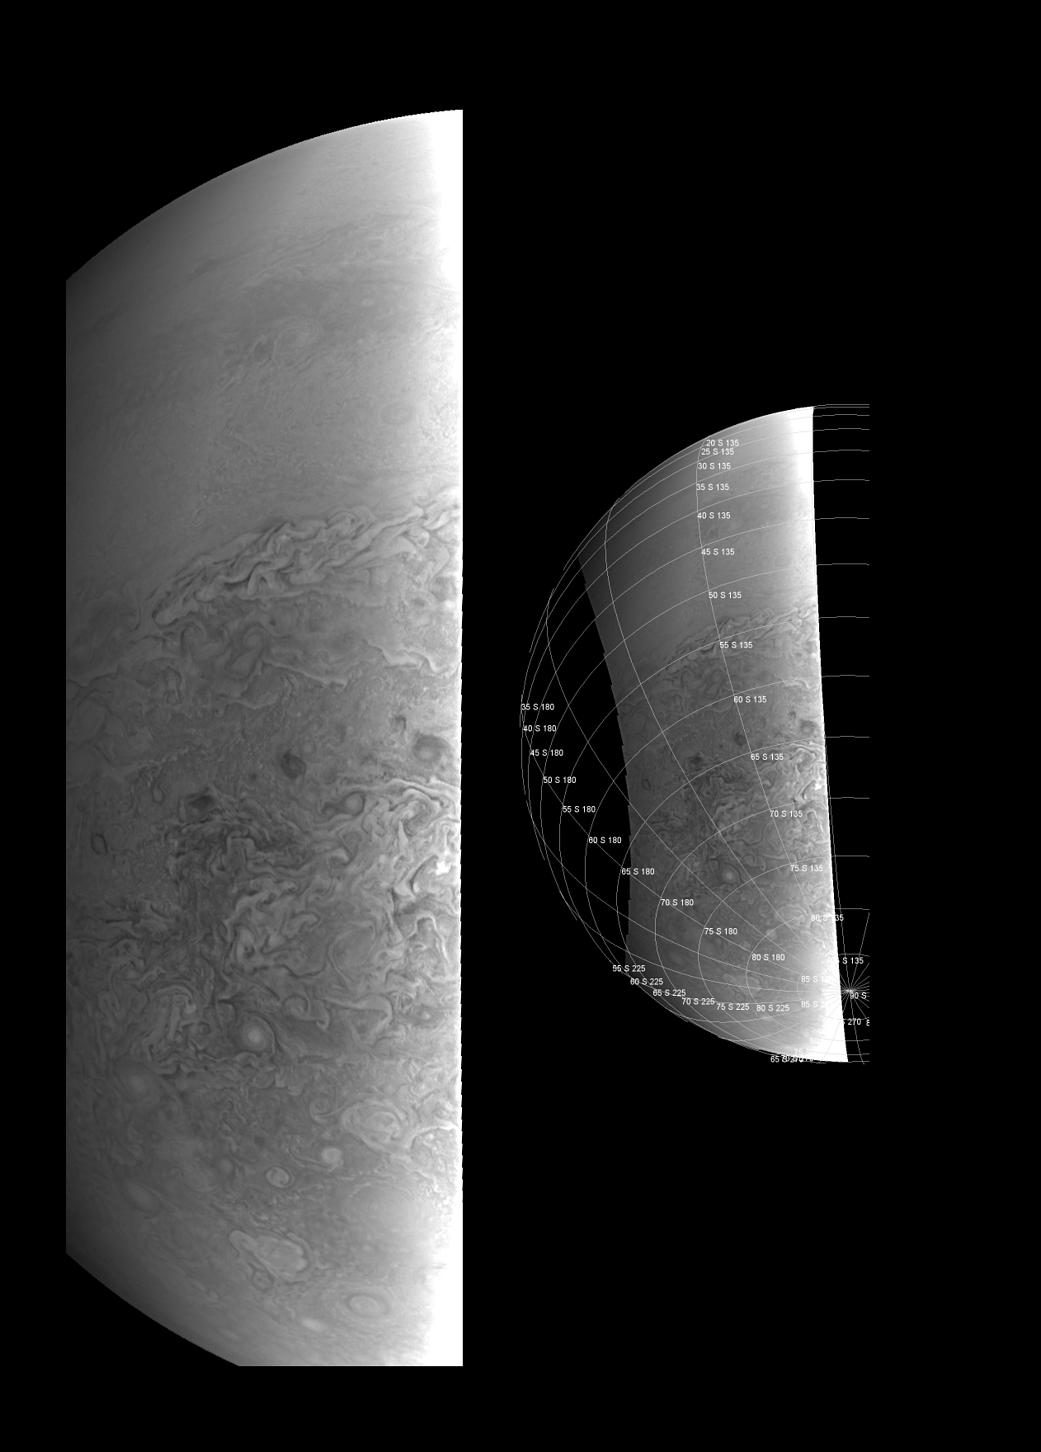 pia21035_5_southern_hemisphere_close-up.